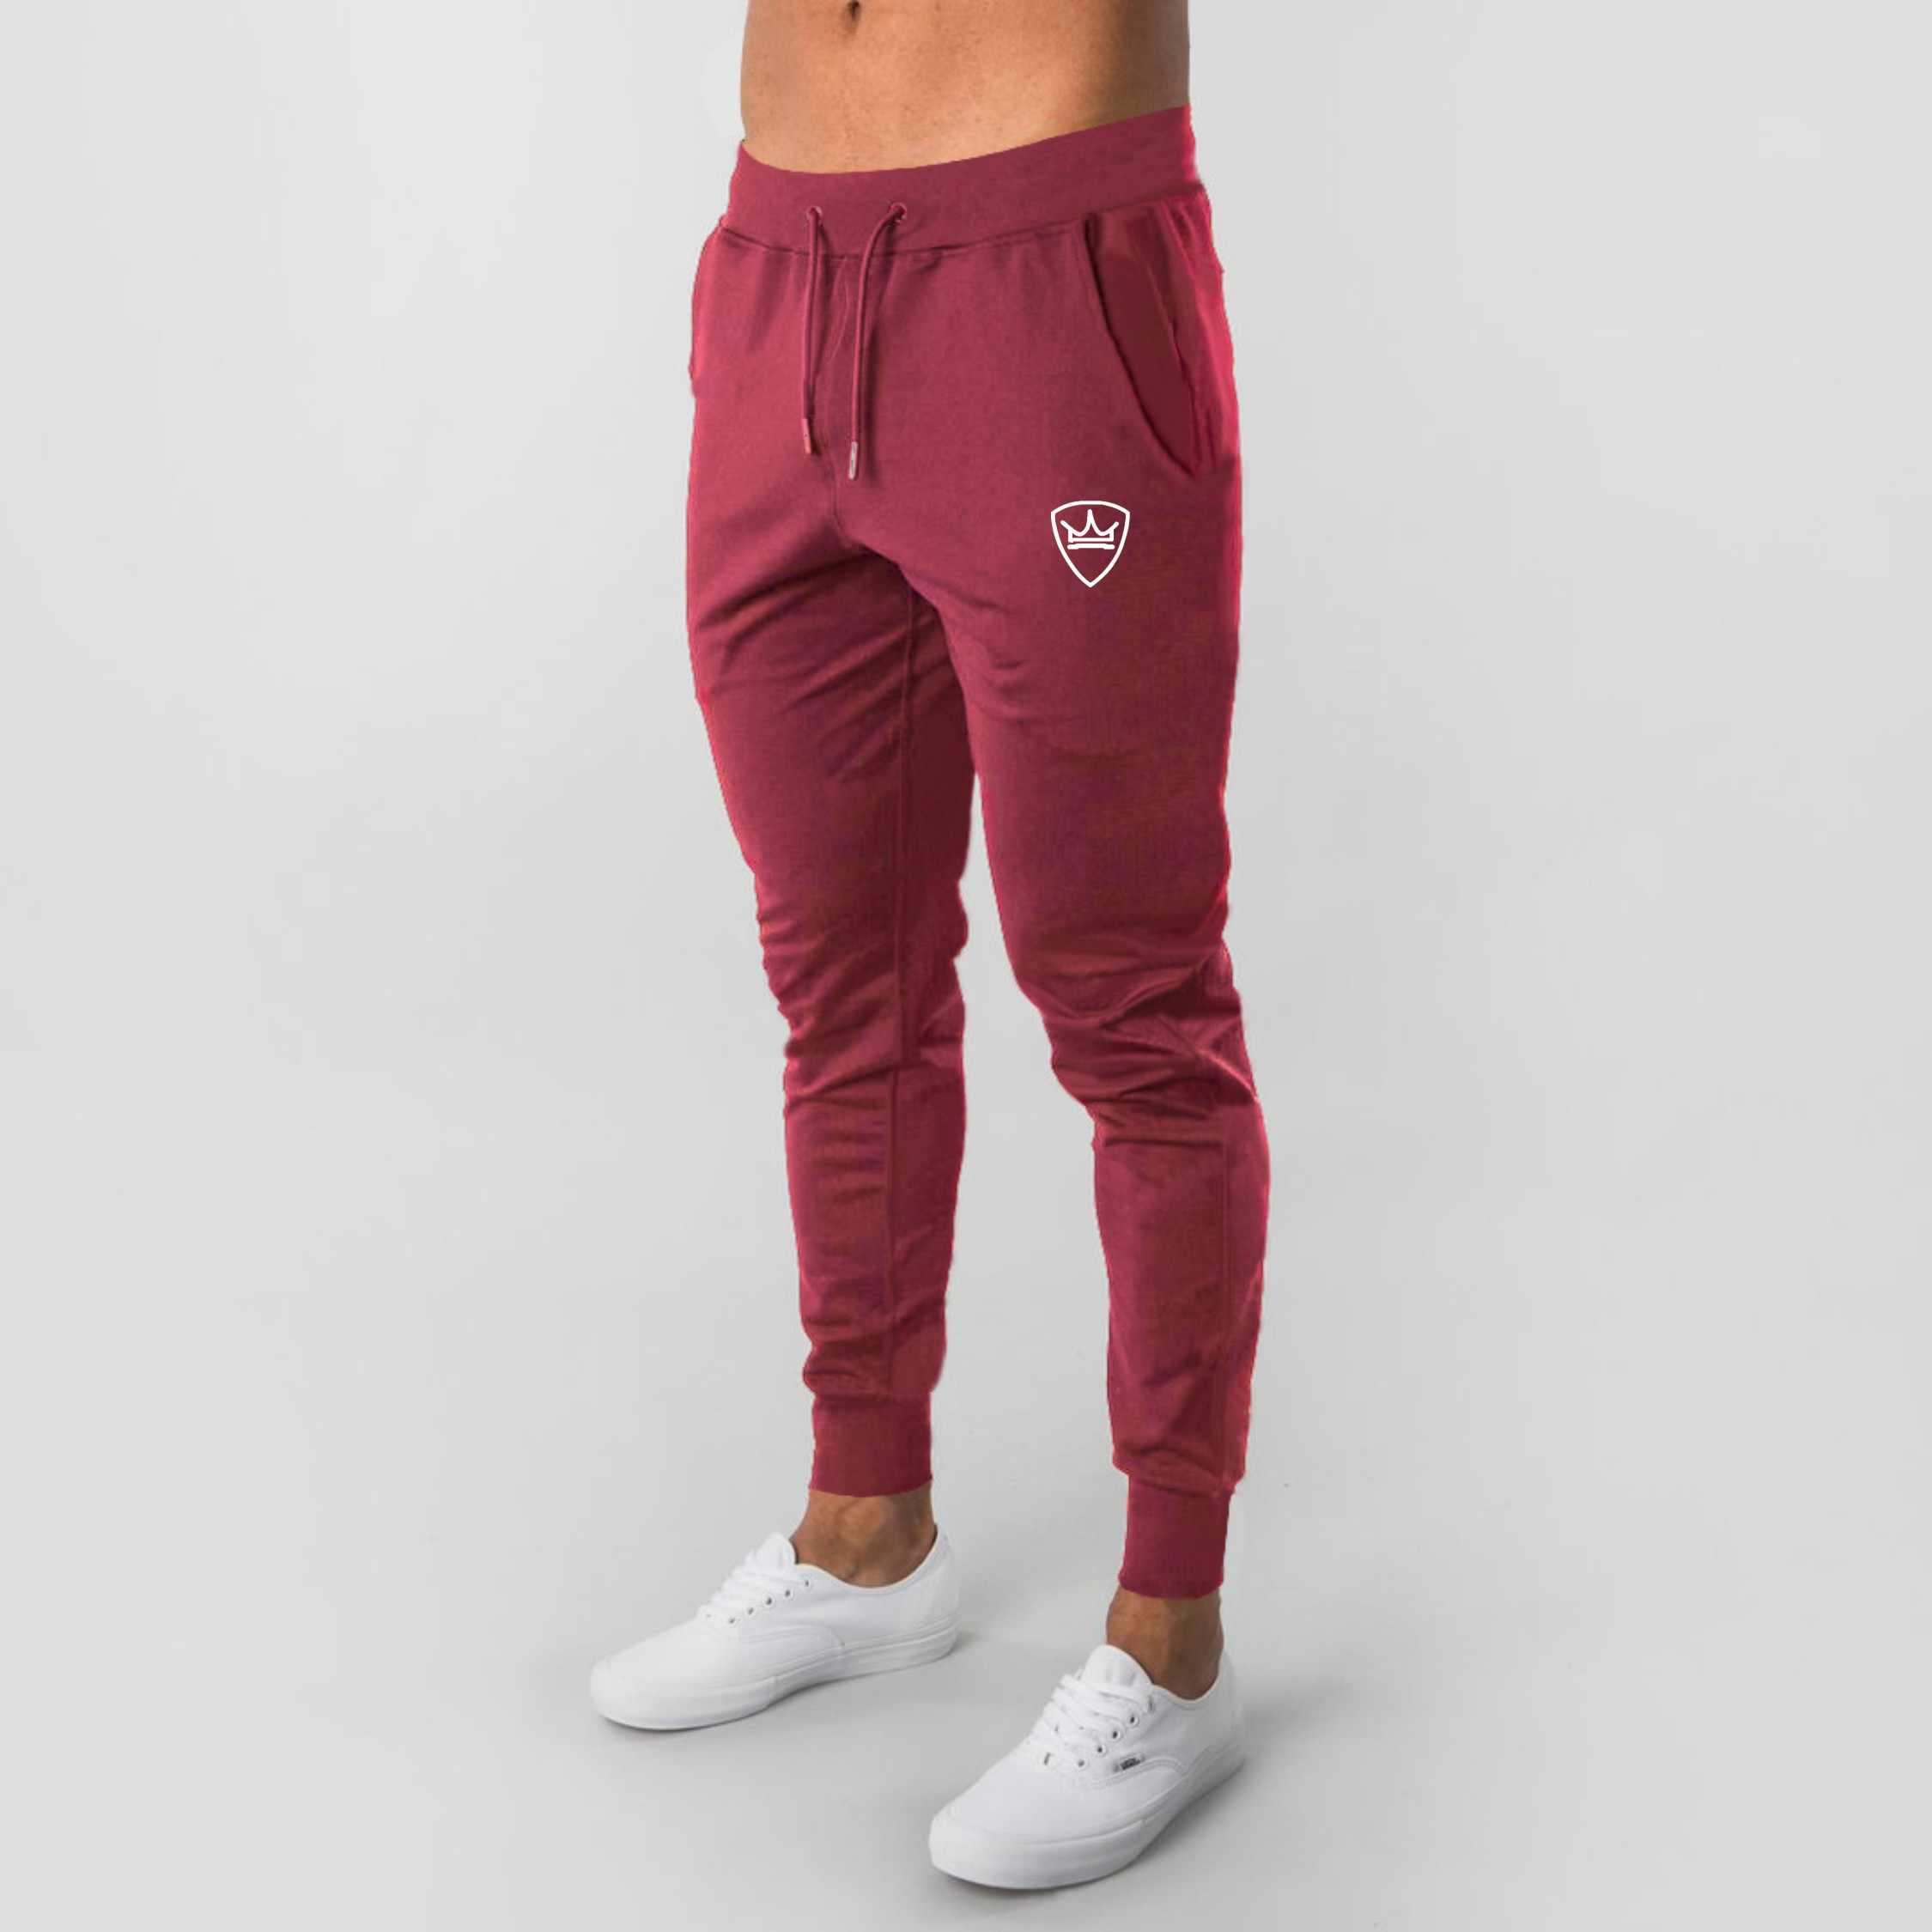 2020 Baru Olahraga Lembut Kurus Celana Pria Jogger Celana Olahraga Gym Kebugaran Latihan Celana Pria Pelatihan Olahraga Celana Pendek Pria